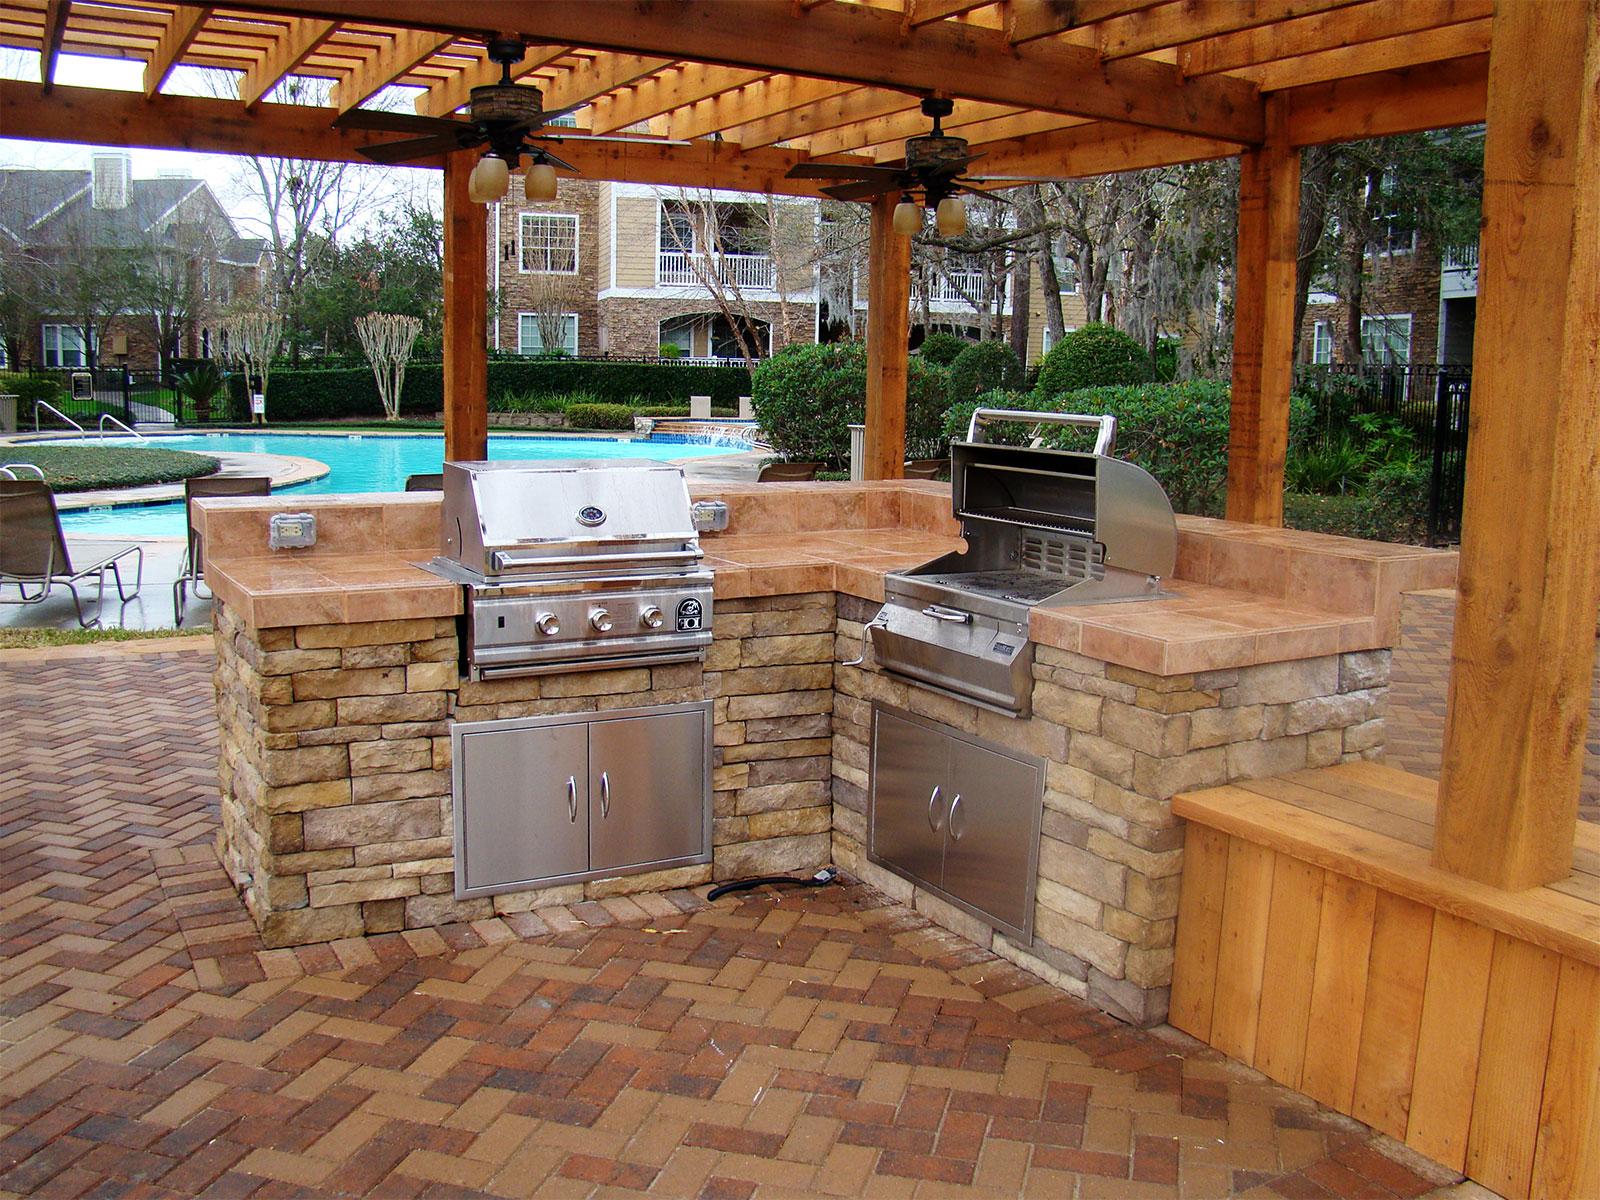 kitchen design backyard kitchen : Furniture Ideas ... on Backyard Kitchen Design id=65969